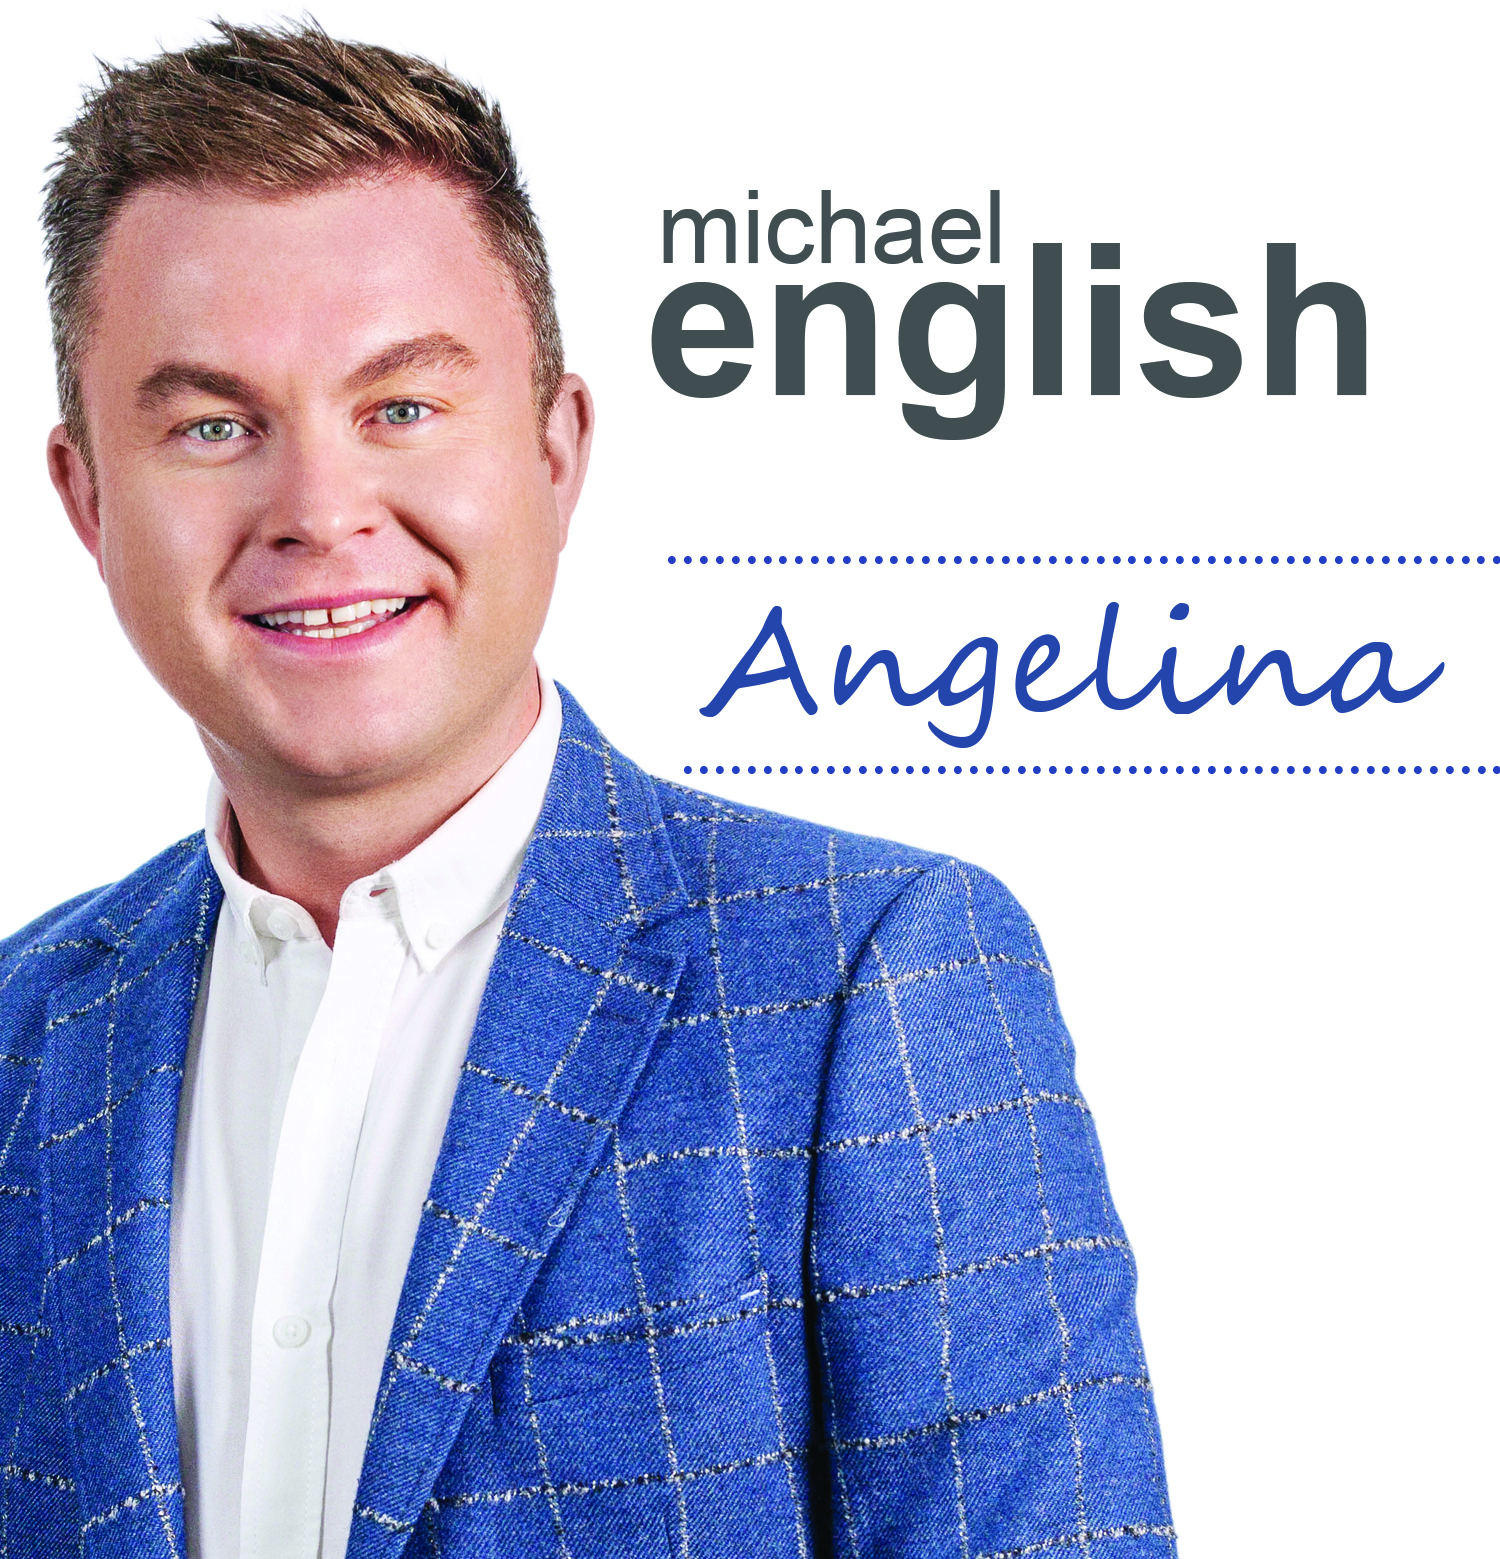 ANGELINA – NEW SINGLE FROM MICHAEL ENGLISH Michael English